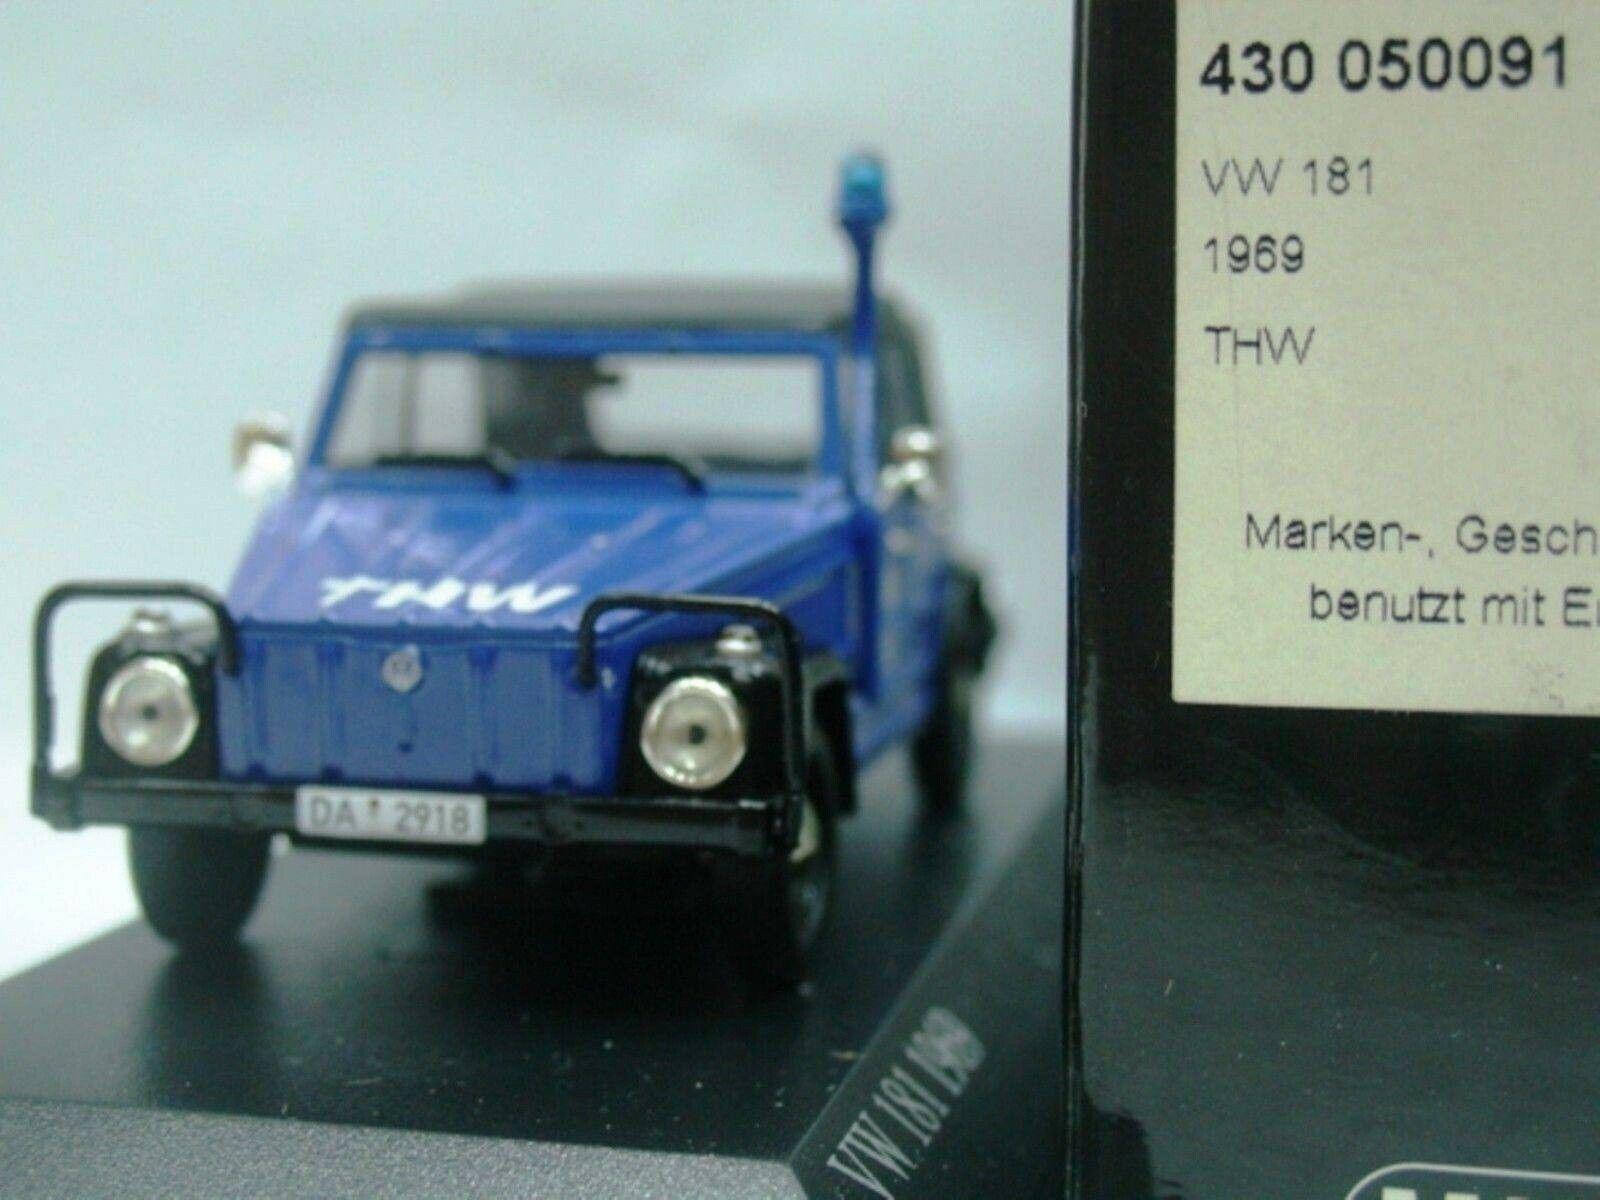 Wow extrêmement rare VW 181 Kubelwagen soft top bleu commandos 1969 1 43 Minichamps